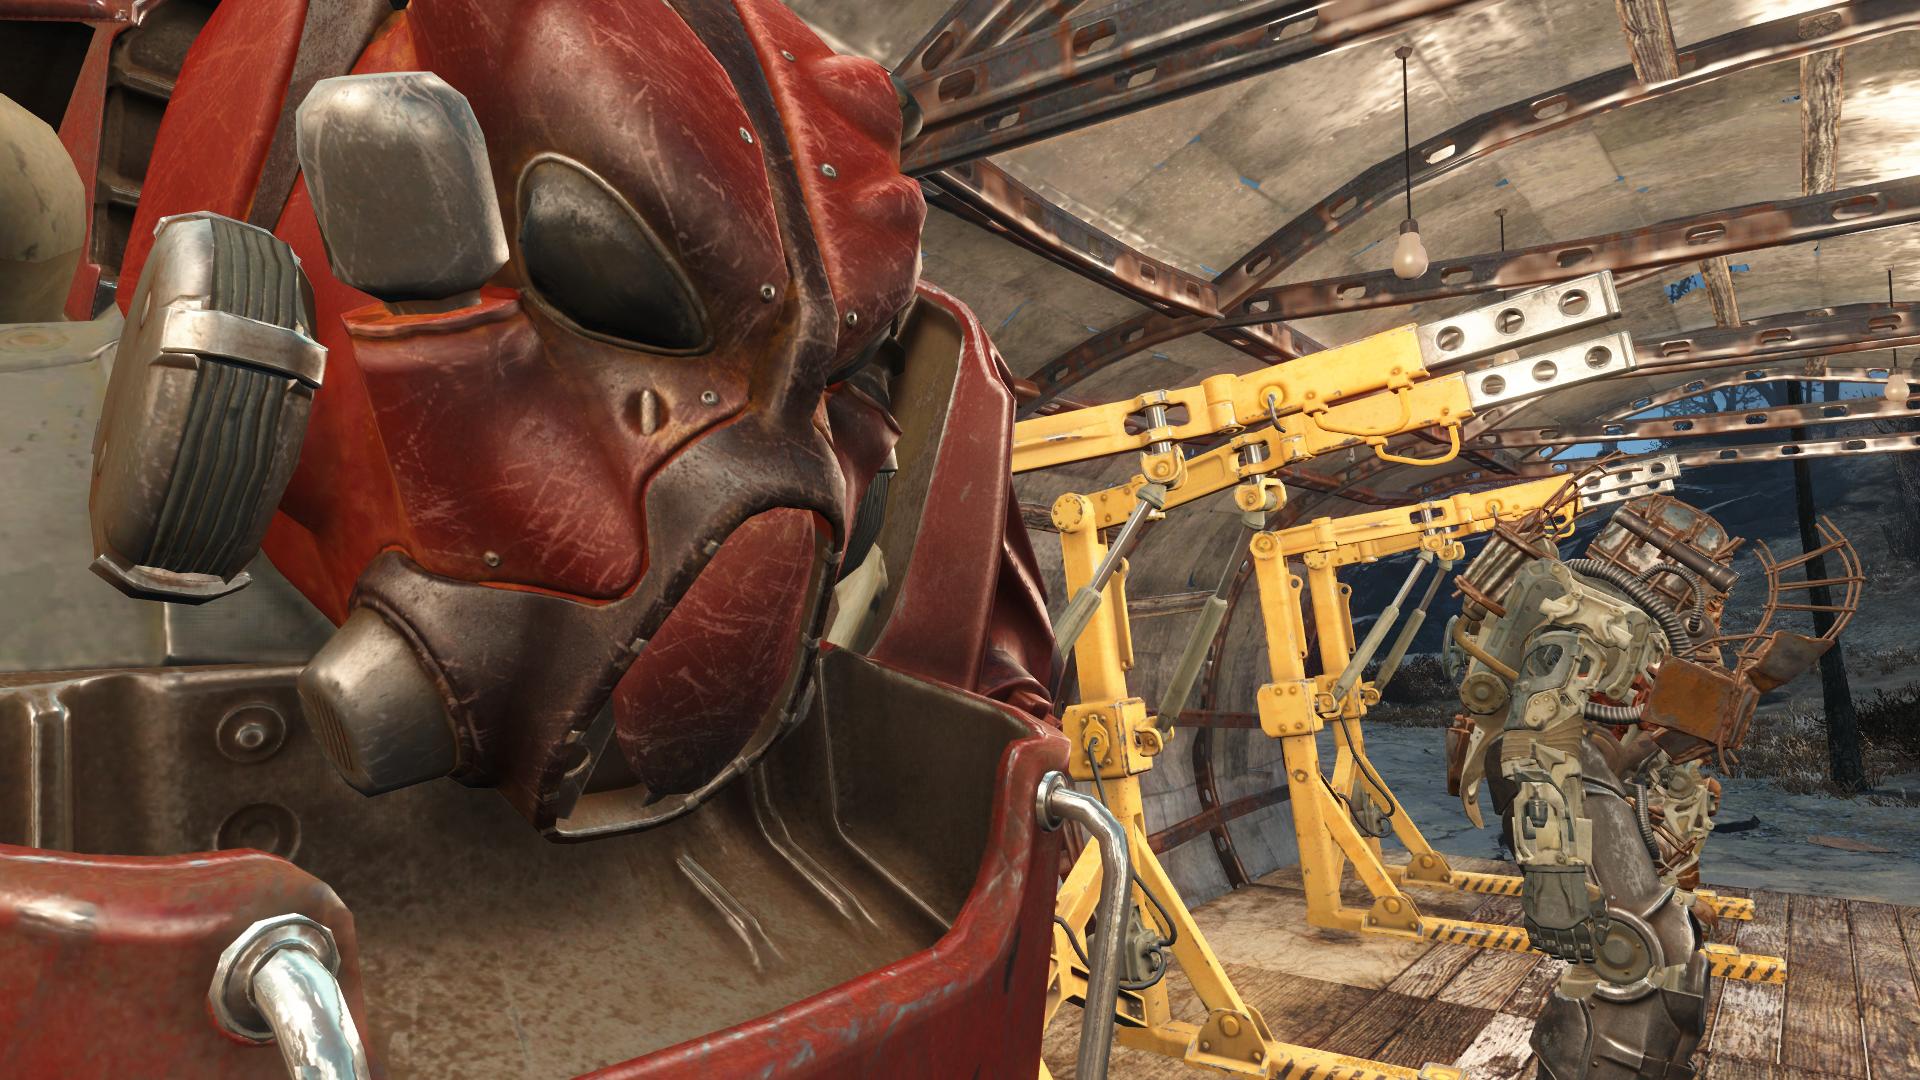 Fallout 4 High Resolution Texture Pack Comparison Screenshots Pc Gamer